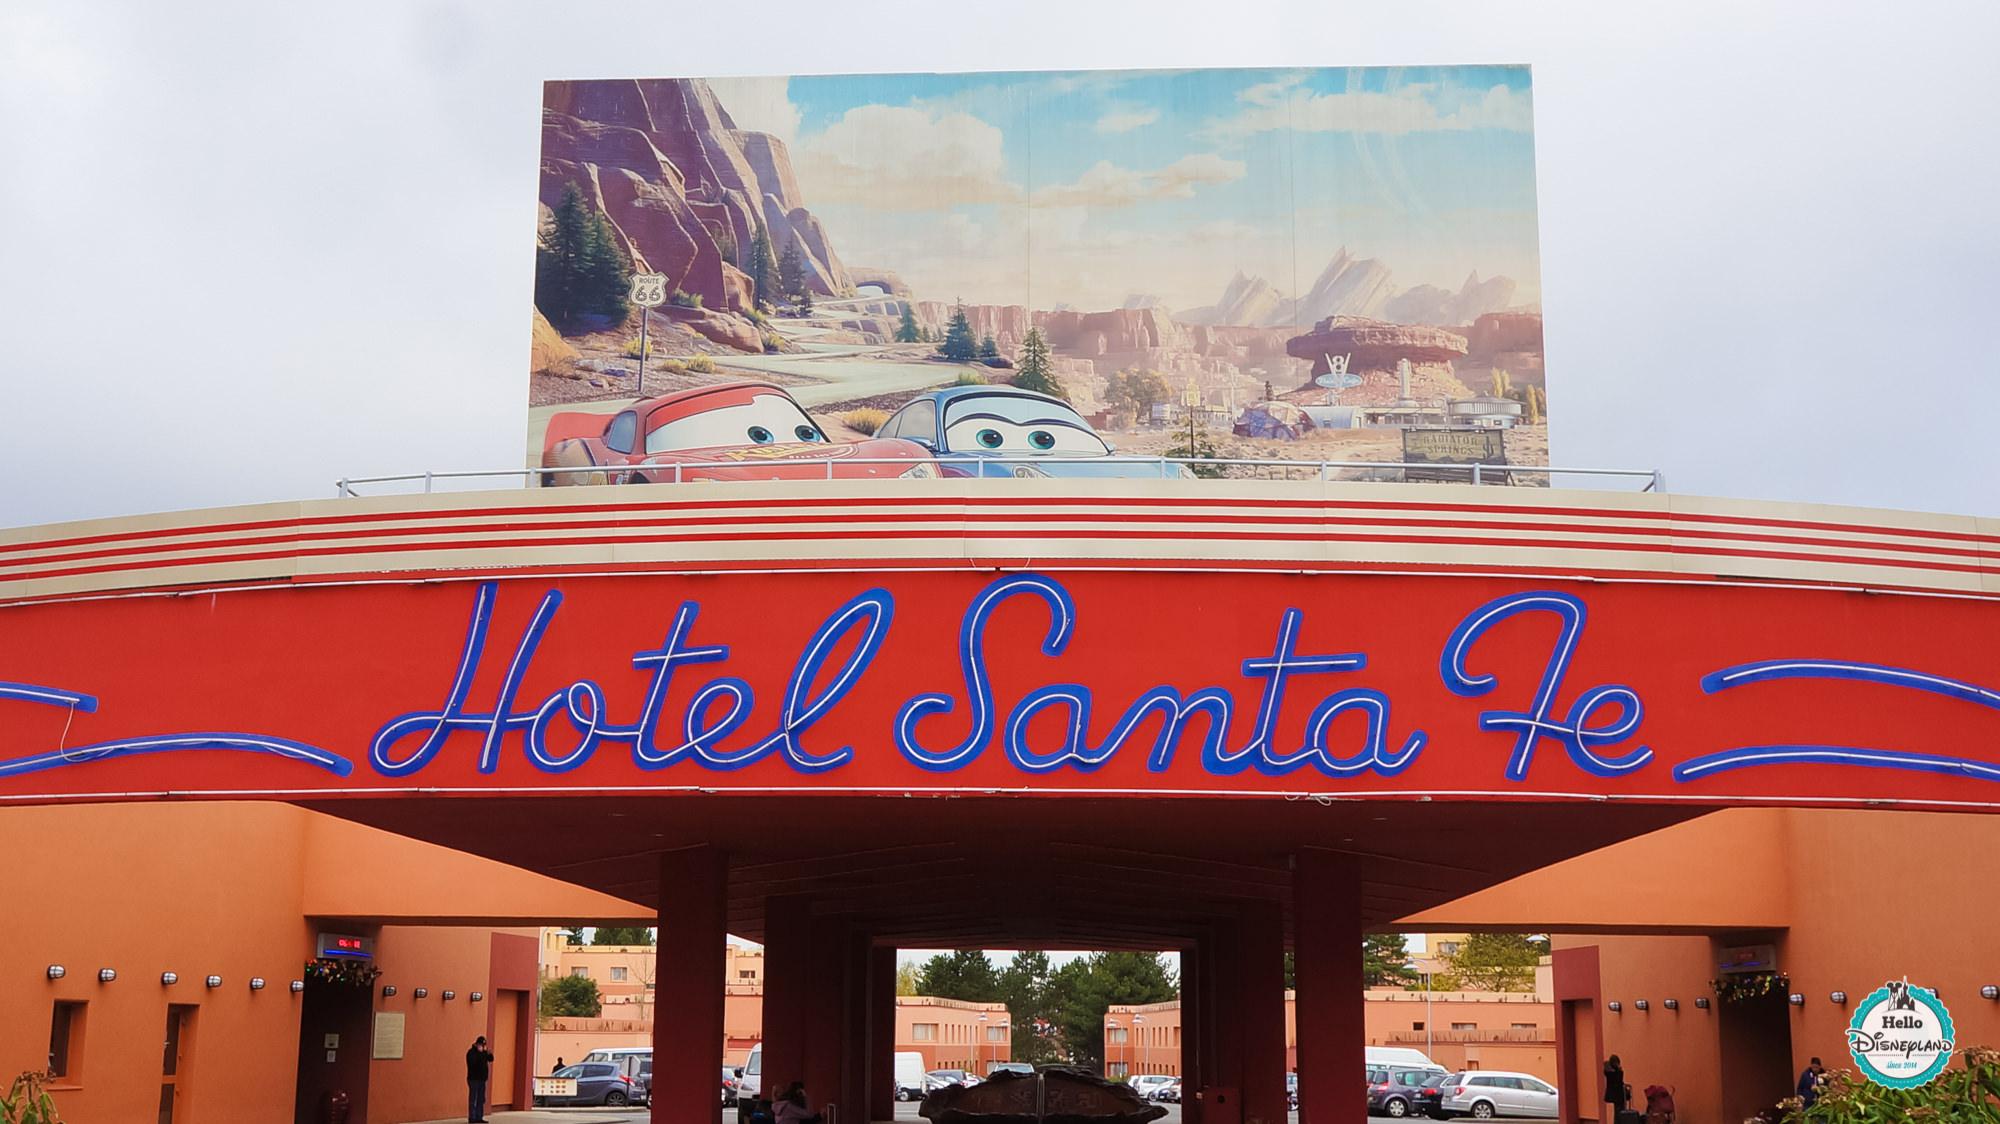 Eurodisney Hotel Santa Fe